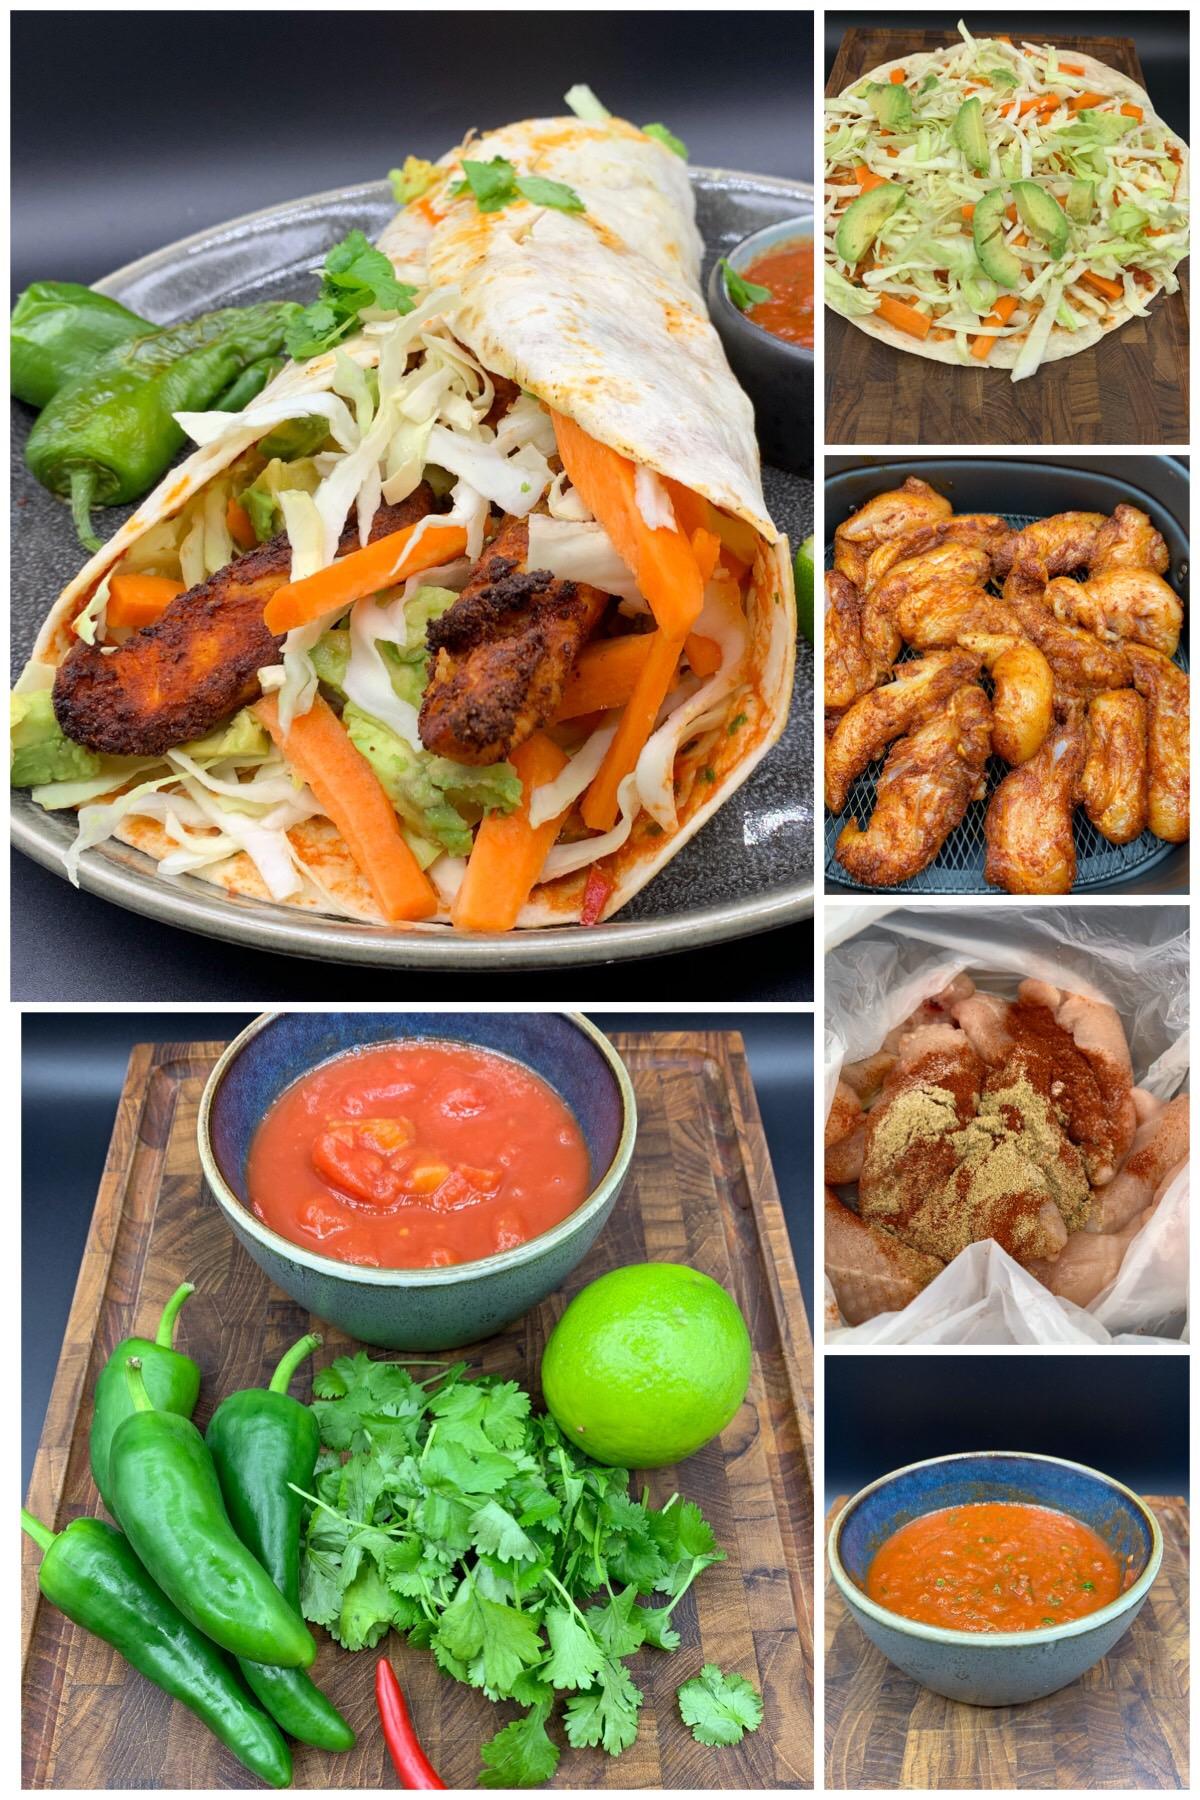 Spicy tortilla wraps med kylling, spidskål, avokado, lime og koriander dressing